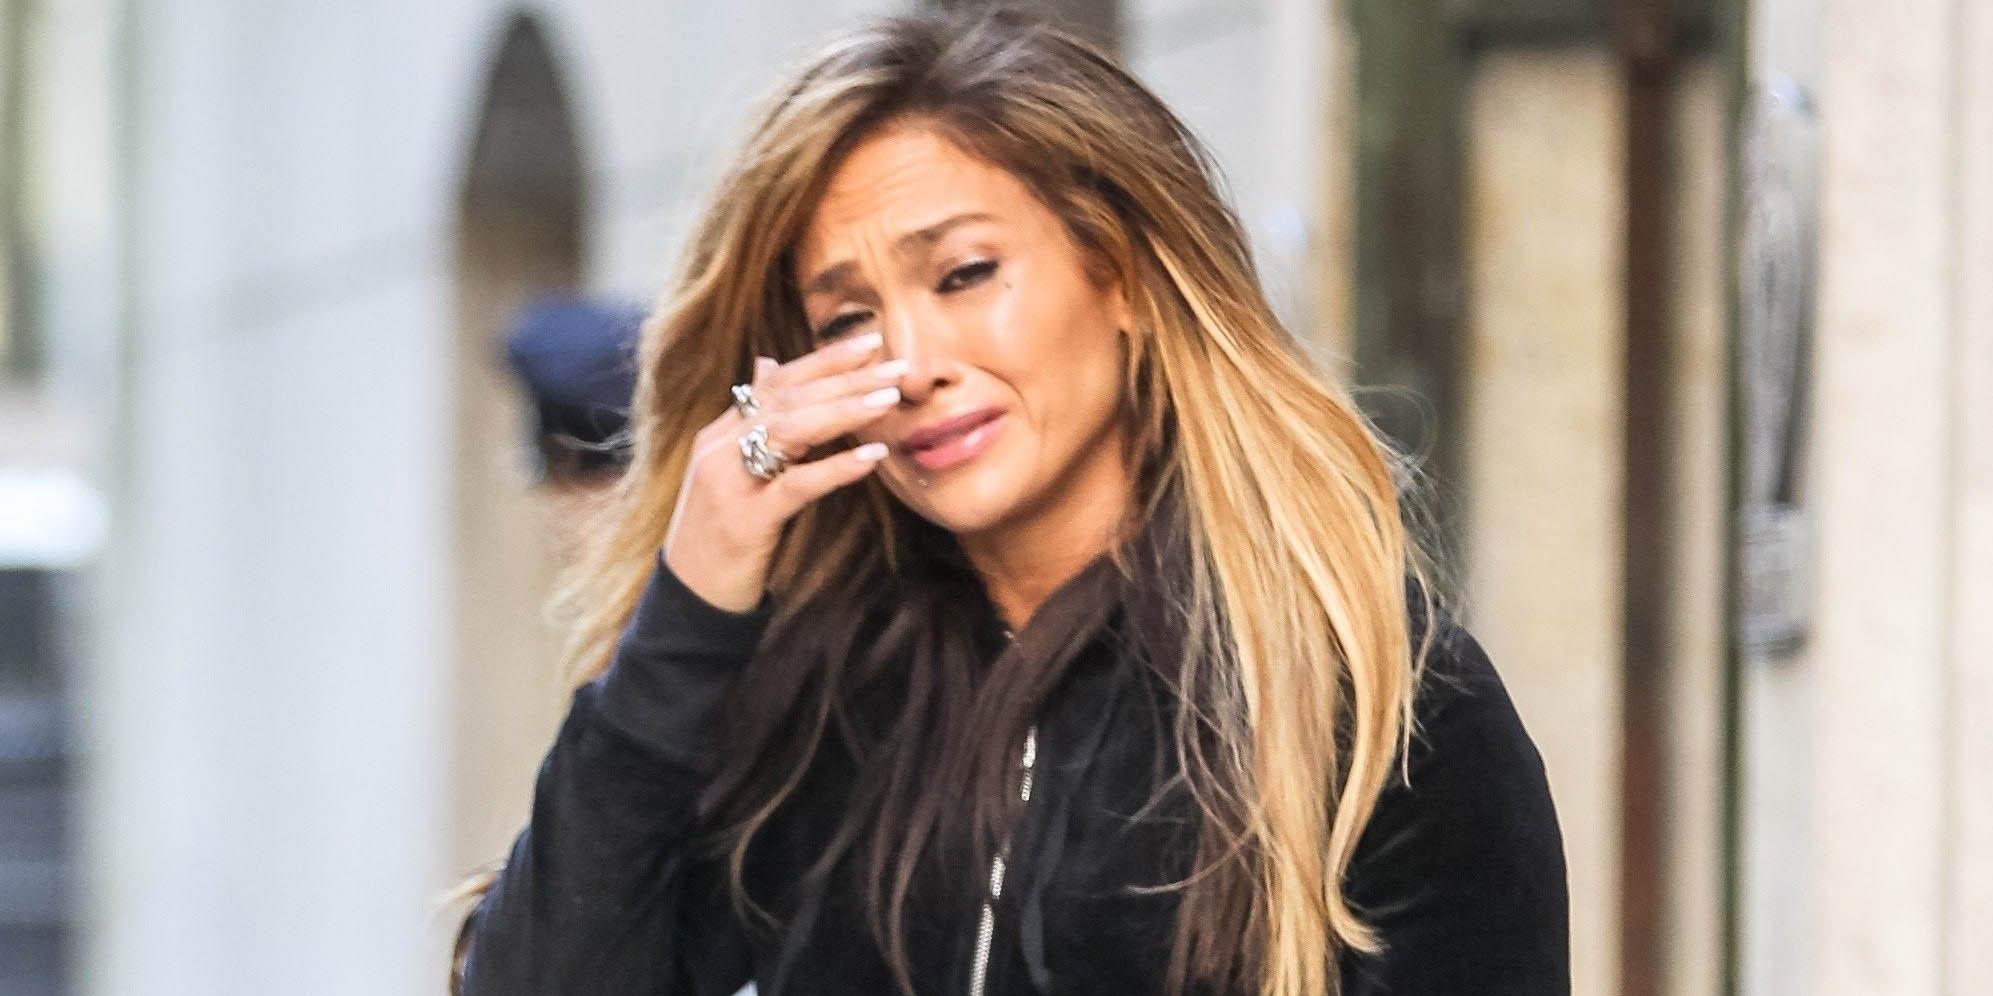 La hija de Jennifer López participa en un vergonzoso vídeo